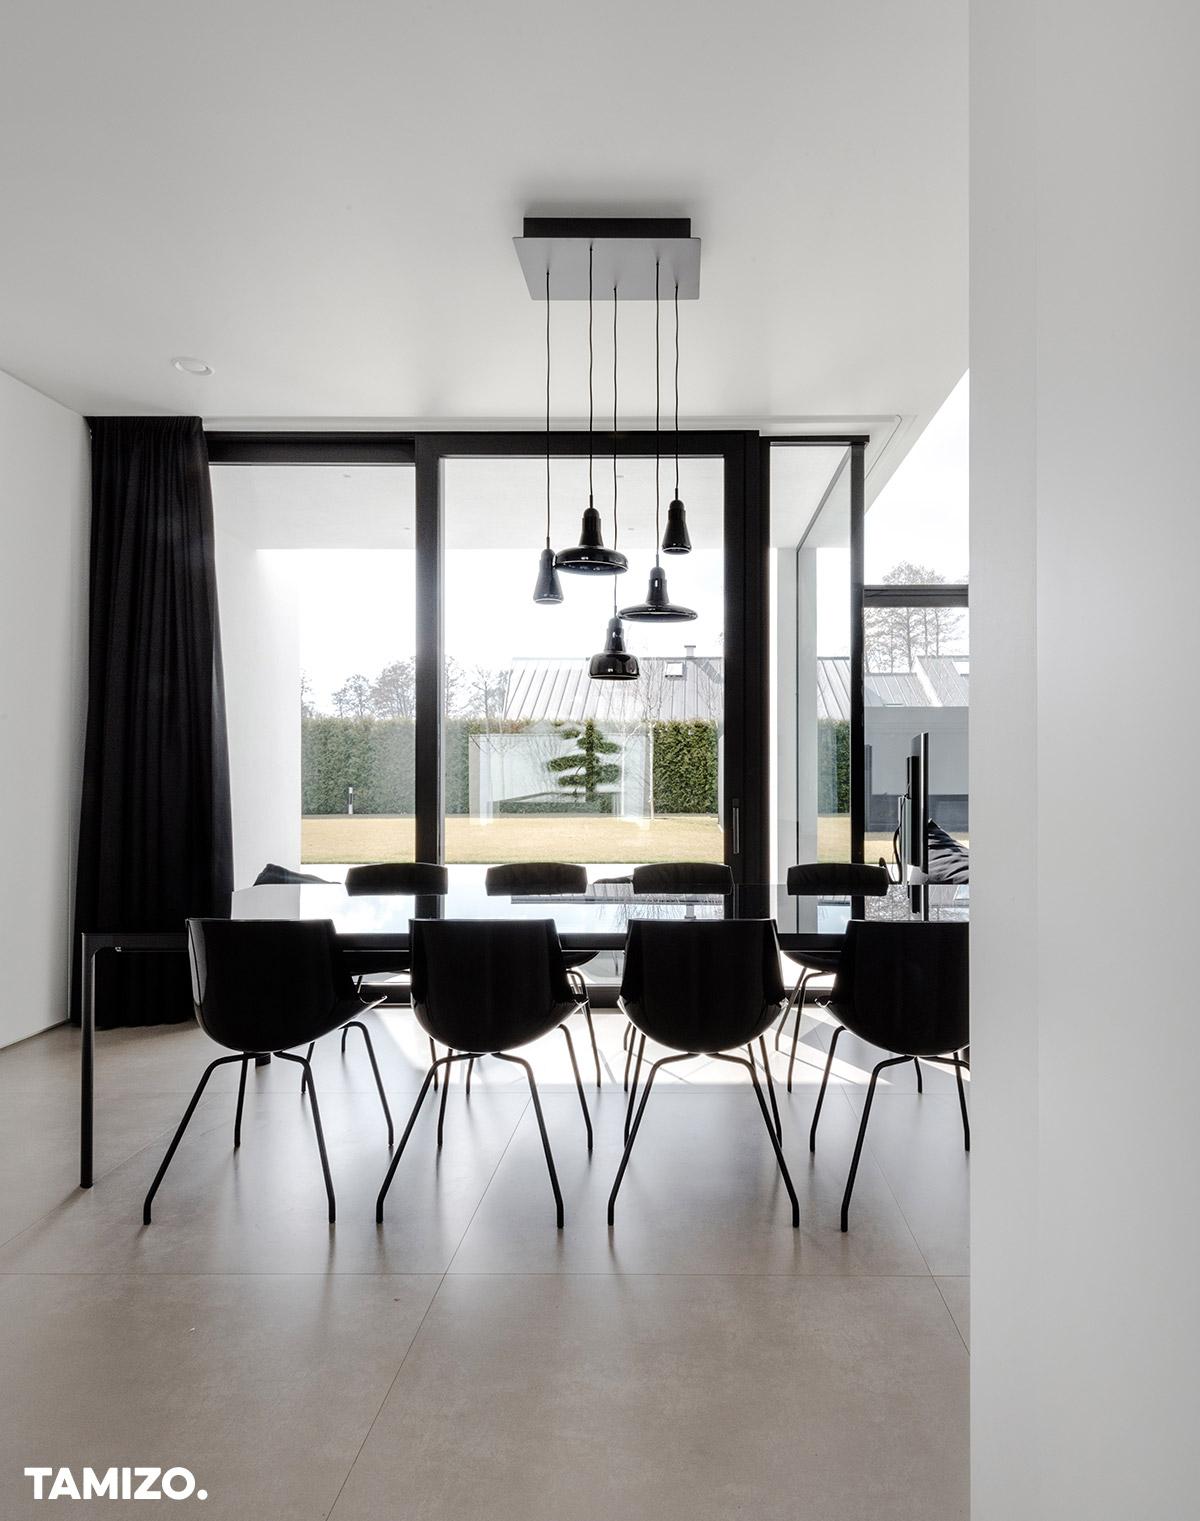 015_tamizo_architects_interior_house_realization_warsaw_poland_39